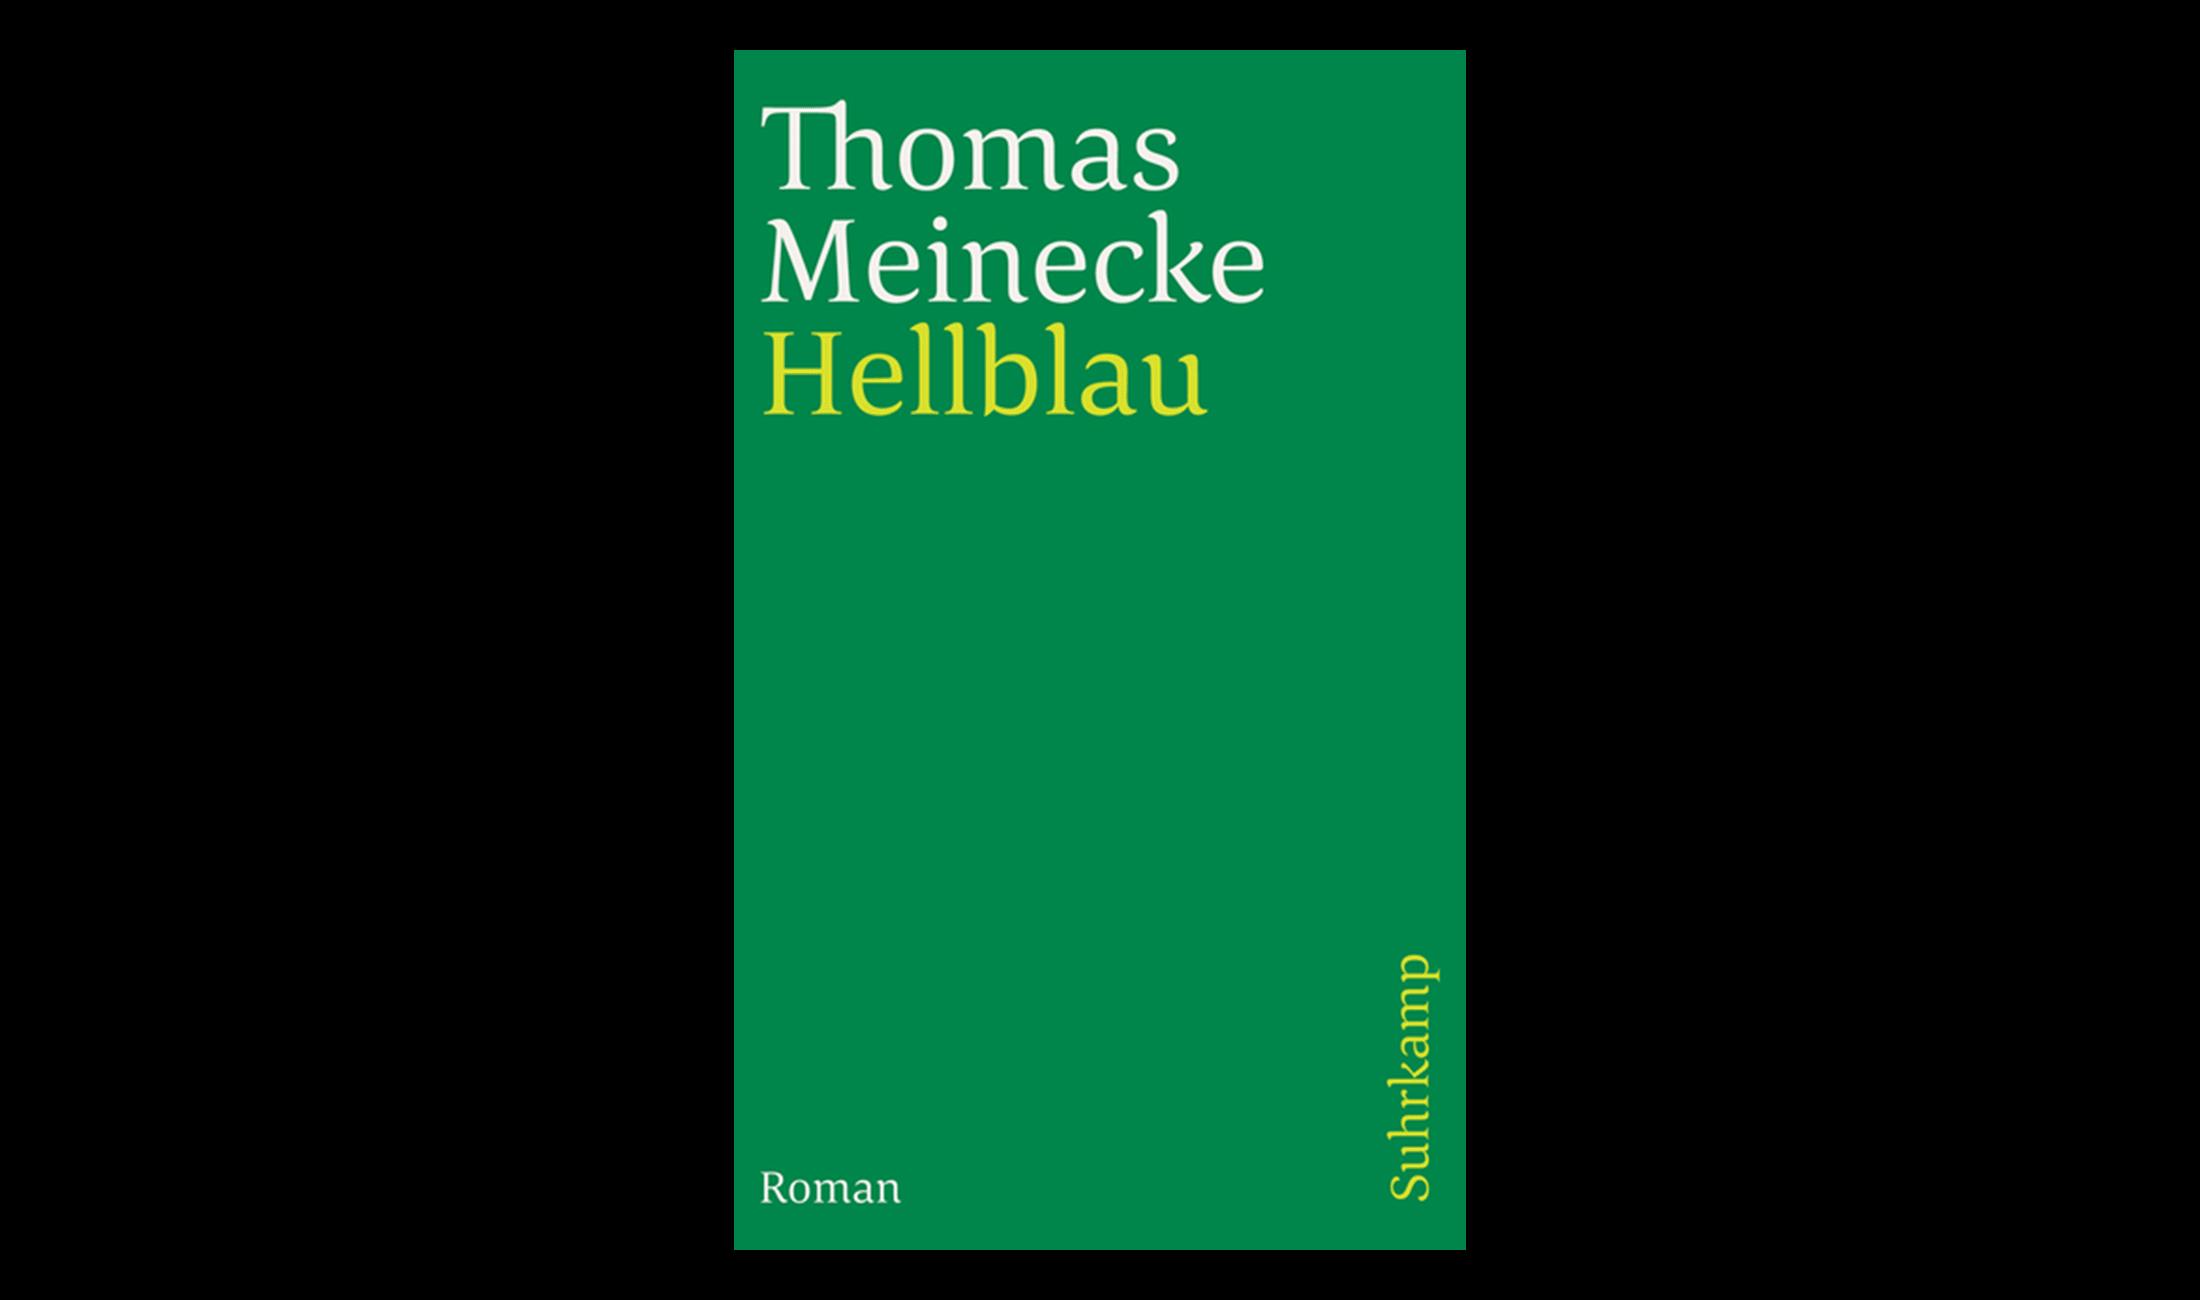 Techno Roman: Hellblau (2001) von Thomas Meinecke.